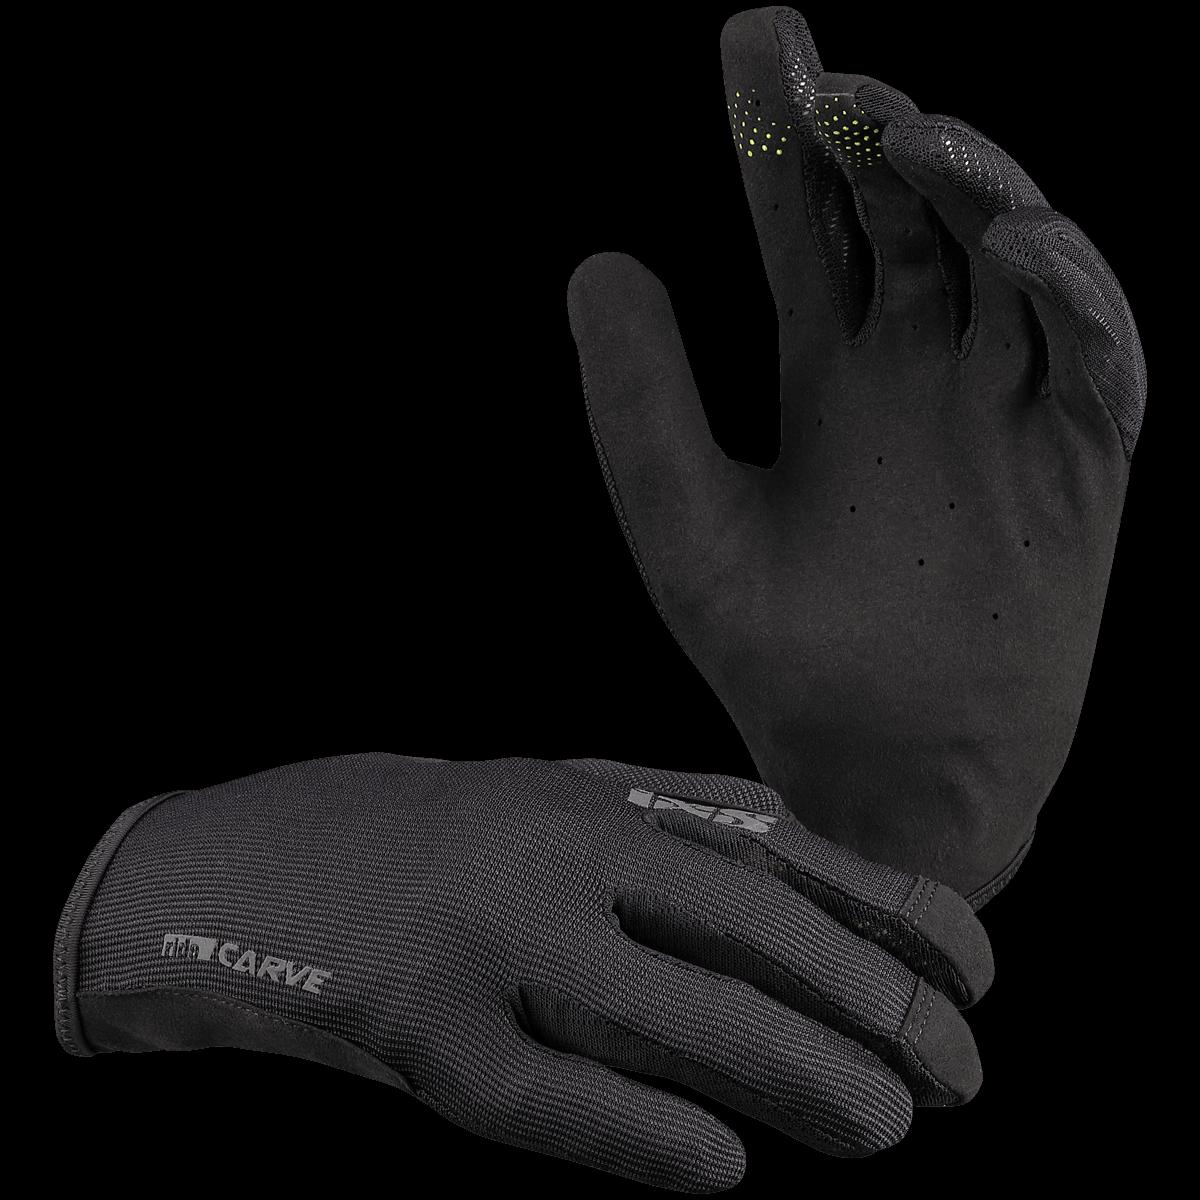 Unisex S Blau IXS Carve Gloves Ocean S Handschuhe Erwachsene